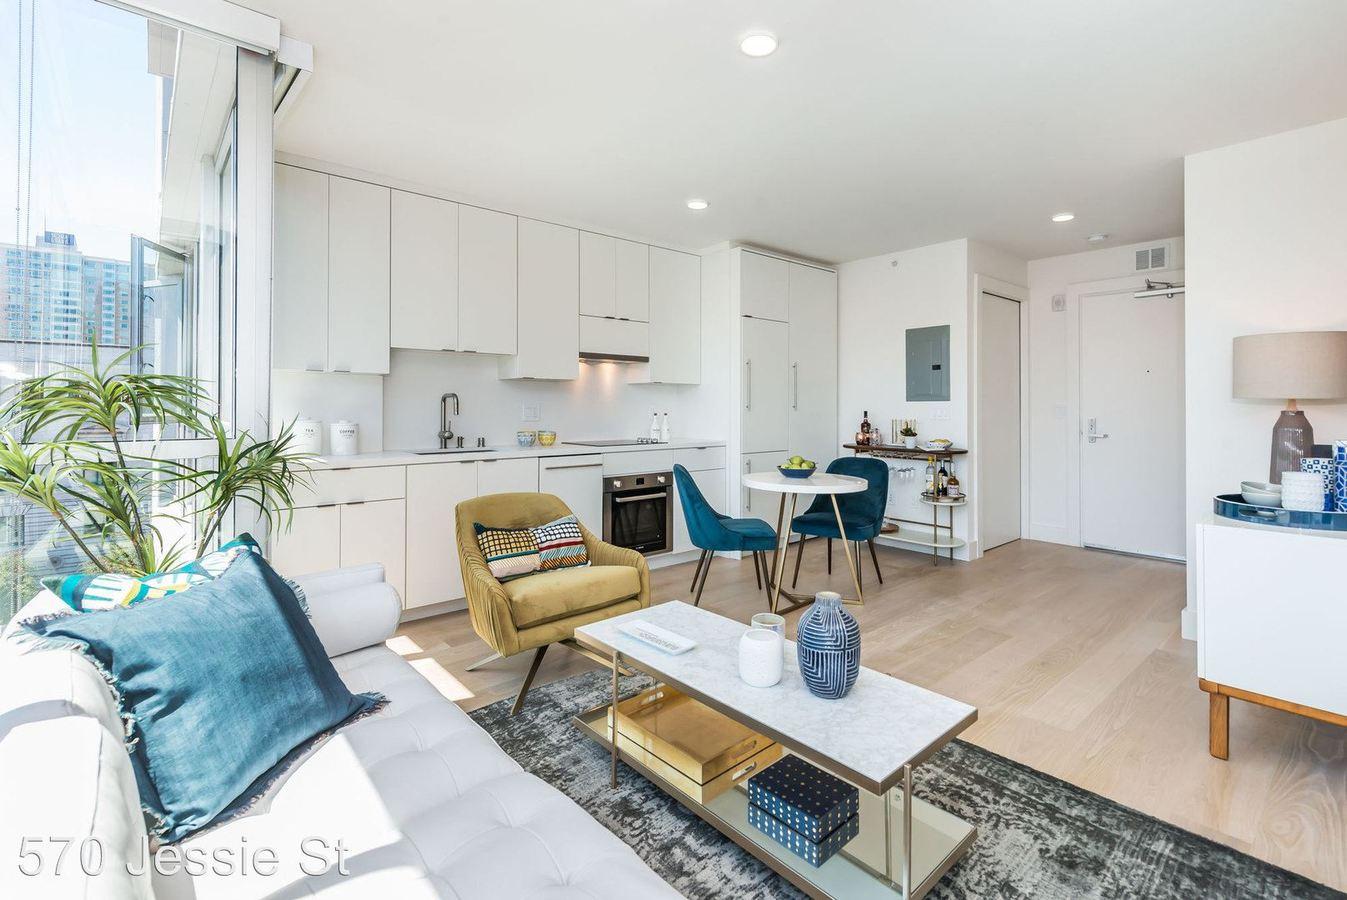 Studio 1 Bathroom Apartment for rent at 570 Jessie Street in San Francisco, CA